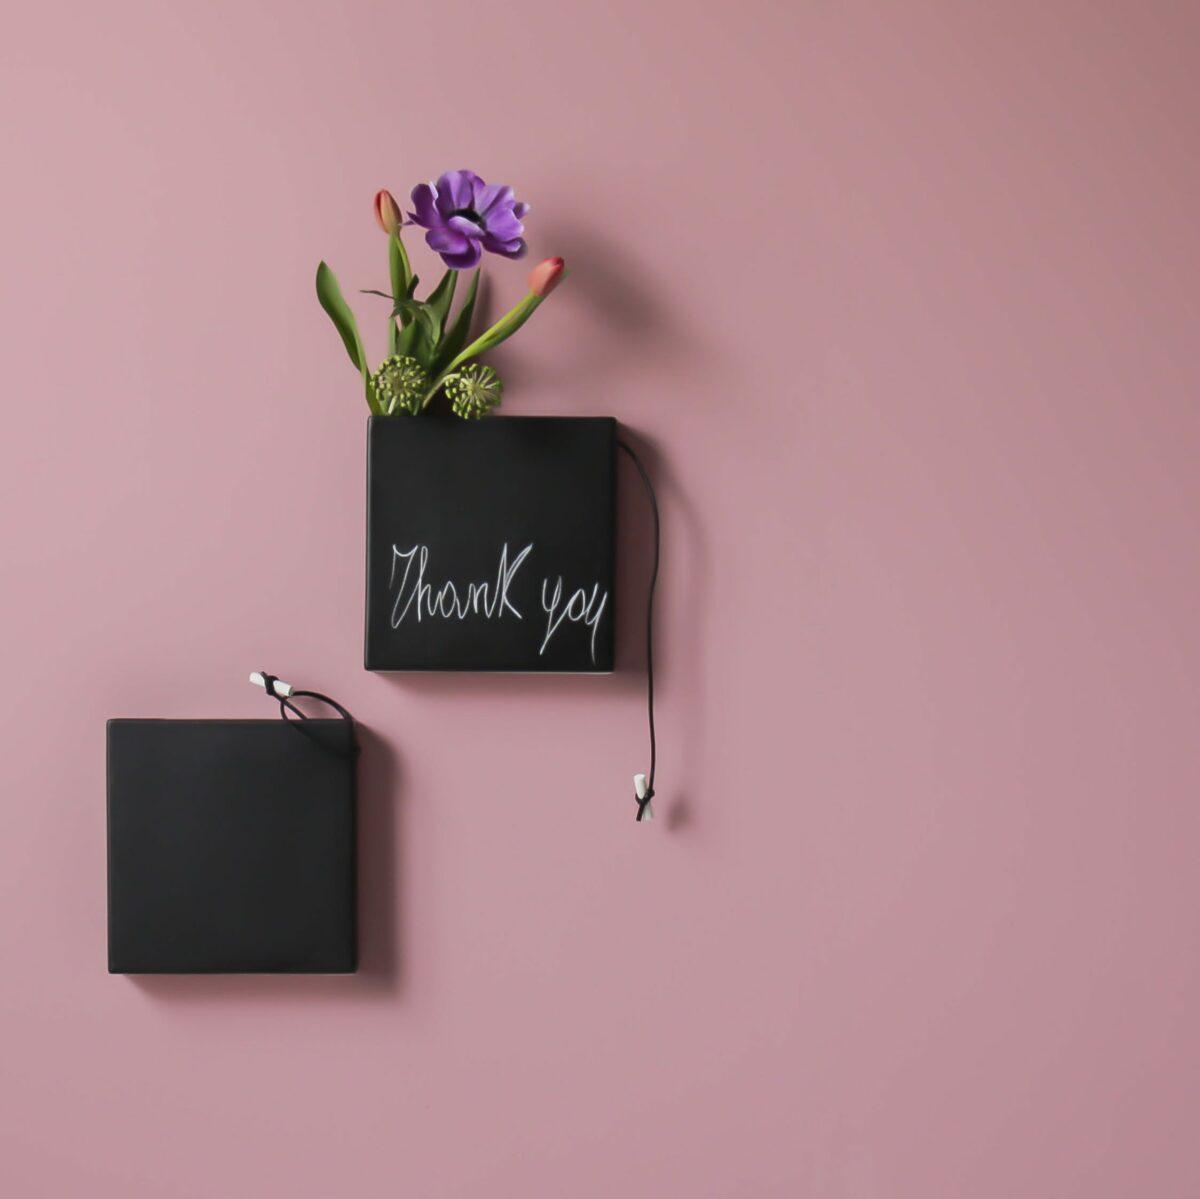 due vasi quadrati neri effetto lavagna sono appesi ad una parete color rosa